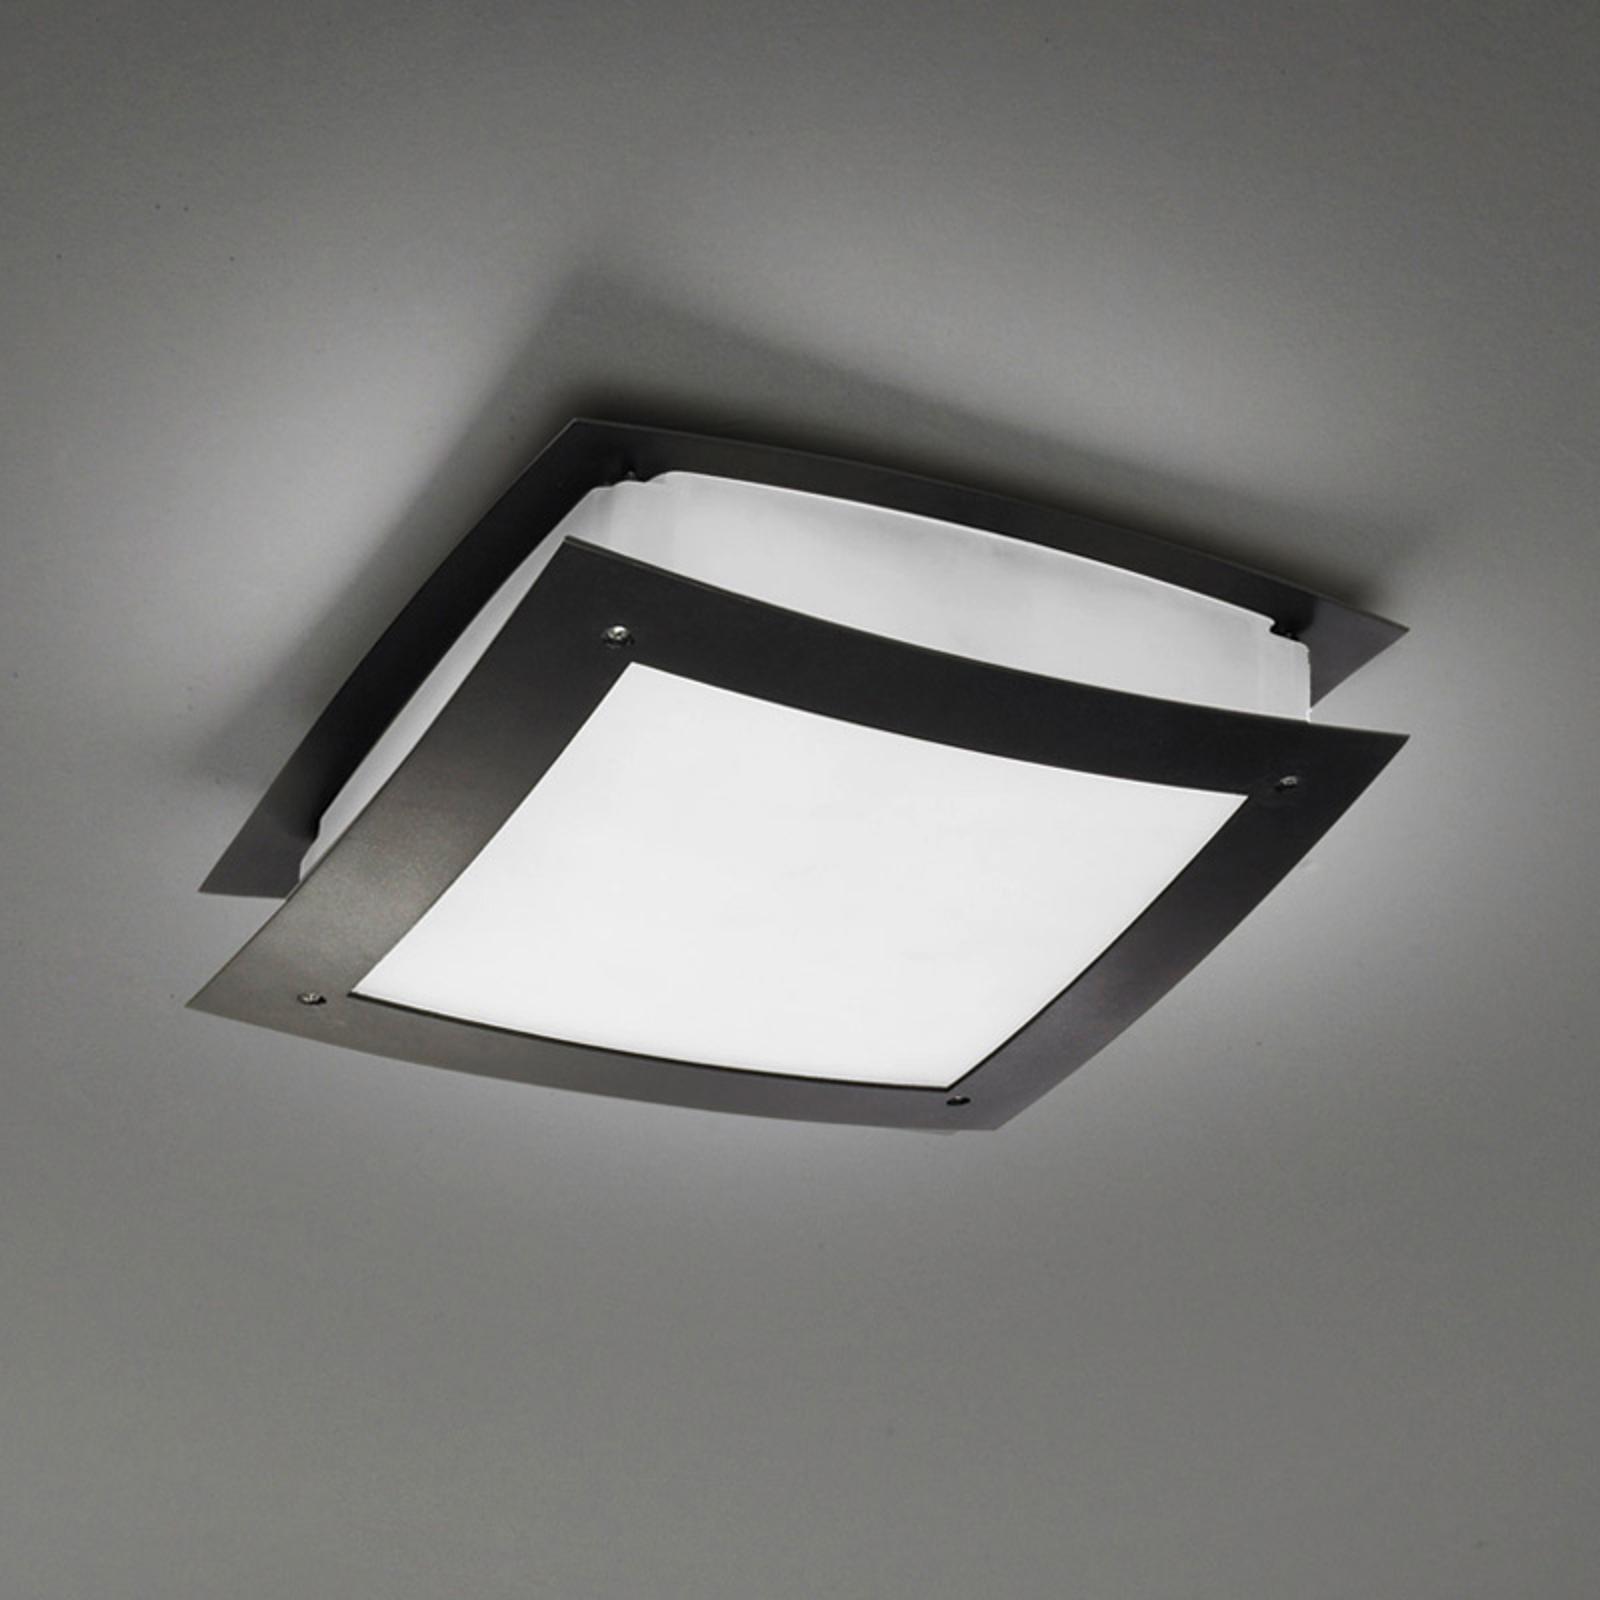 Mooie buitenplafondlamp Darwin